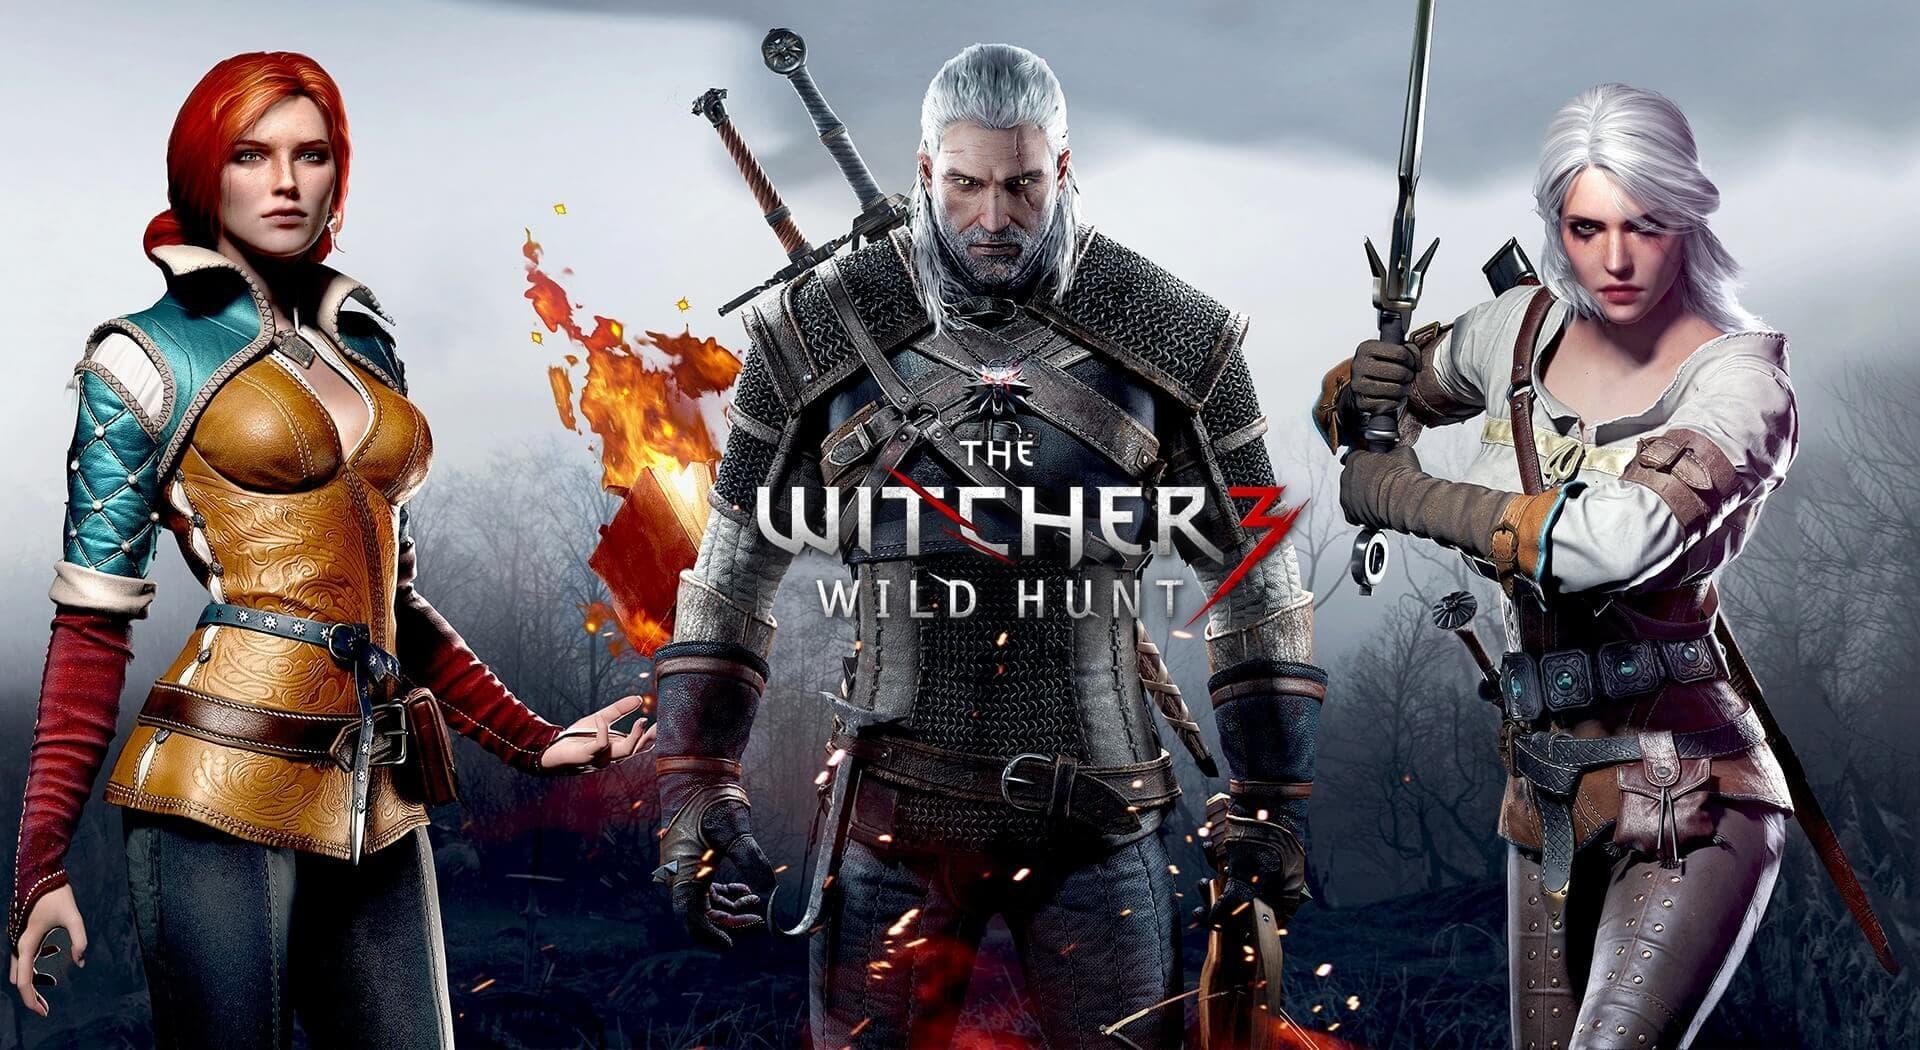 The Witcher 3 Wild Hunt Geralt, Triss, and Ciri Wallpaper